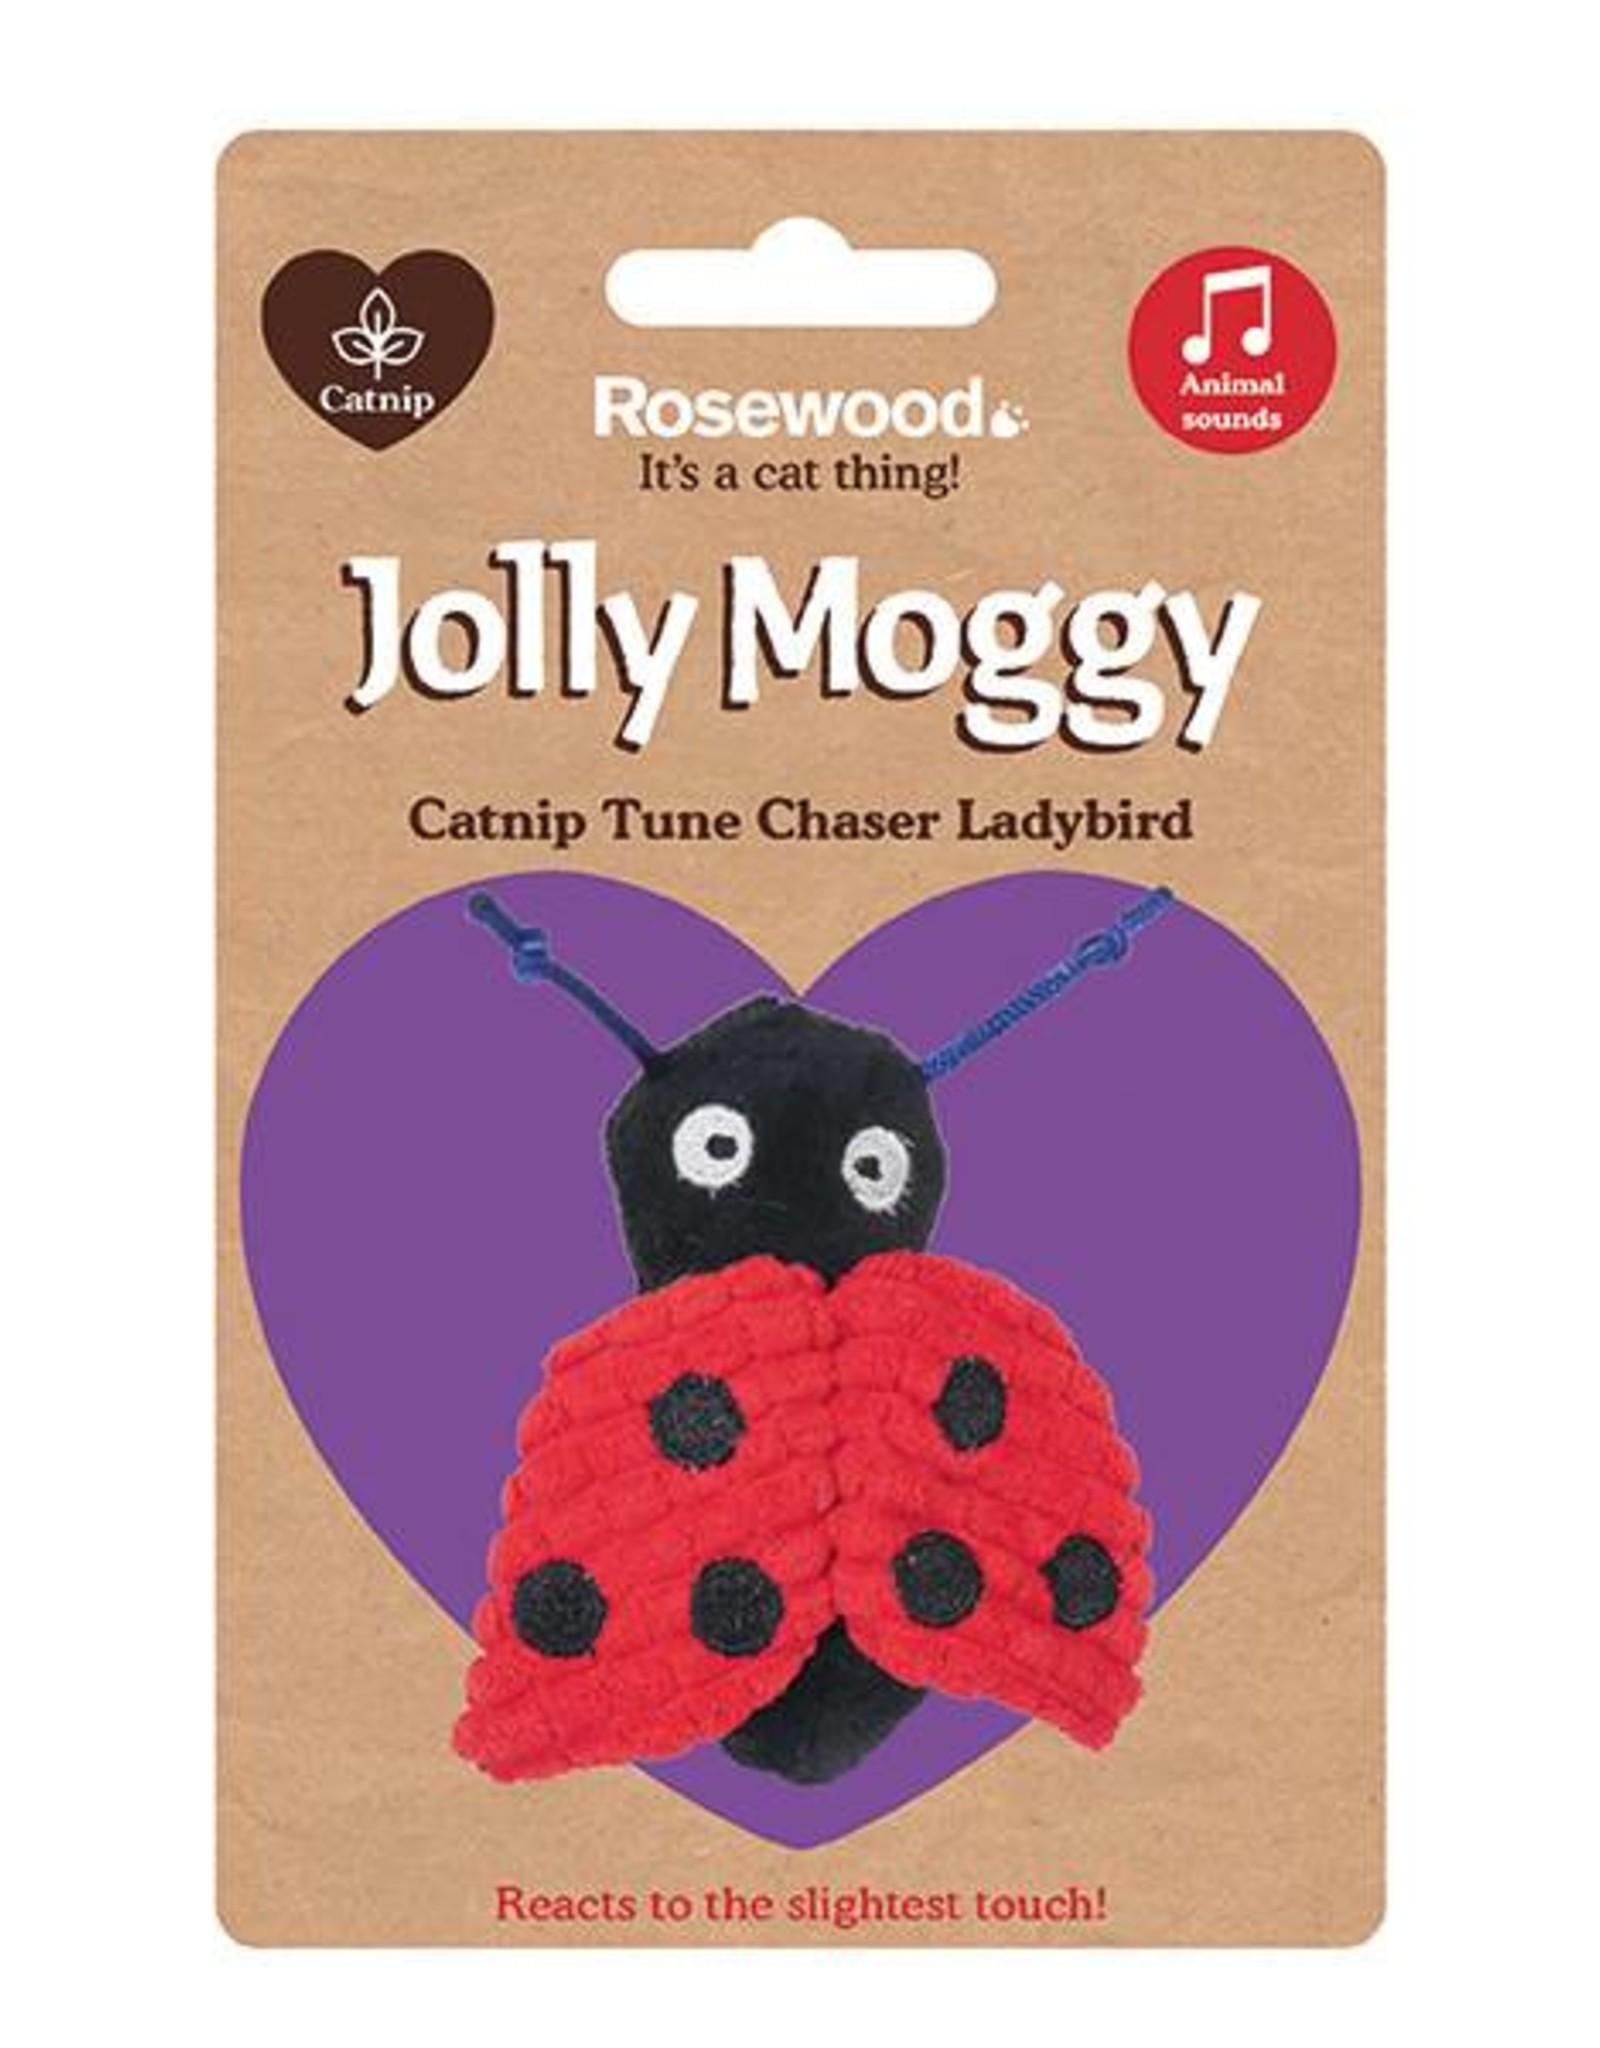 Rosewood Catnip Tune Chaser Ladybird Cat Toy